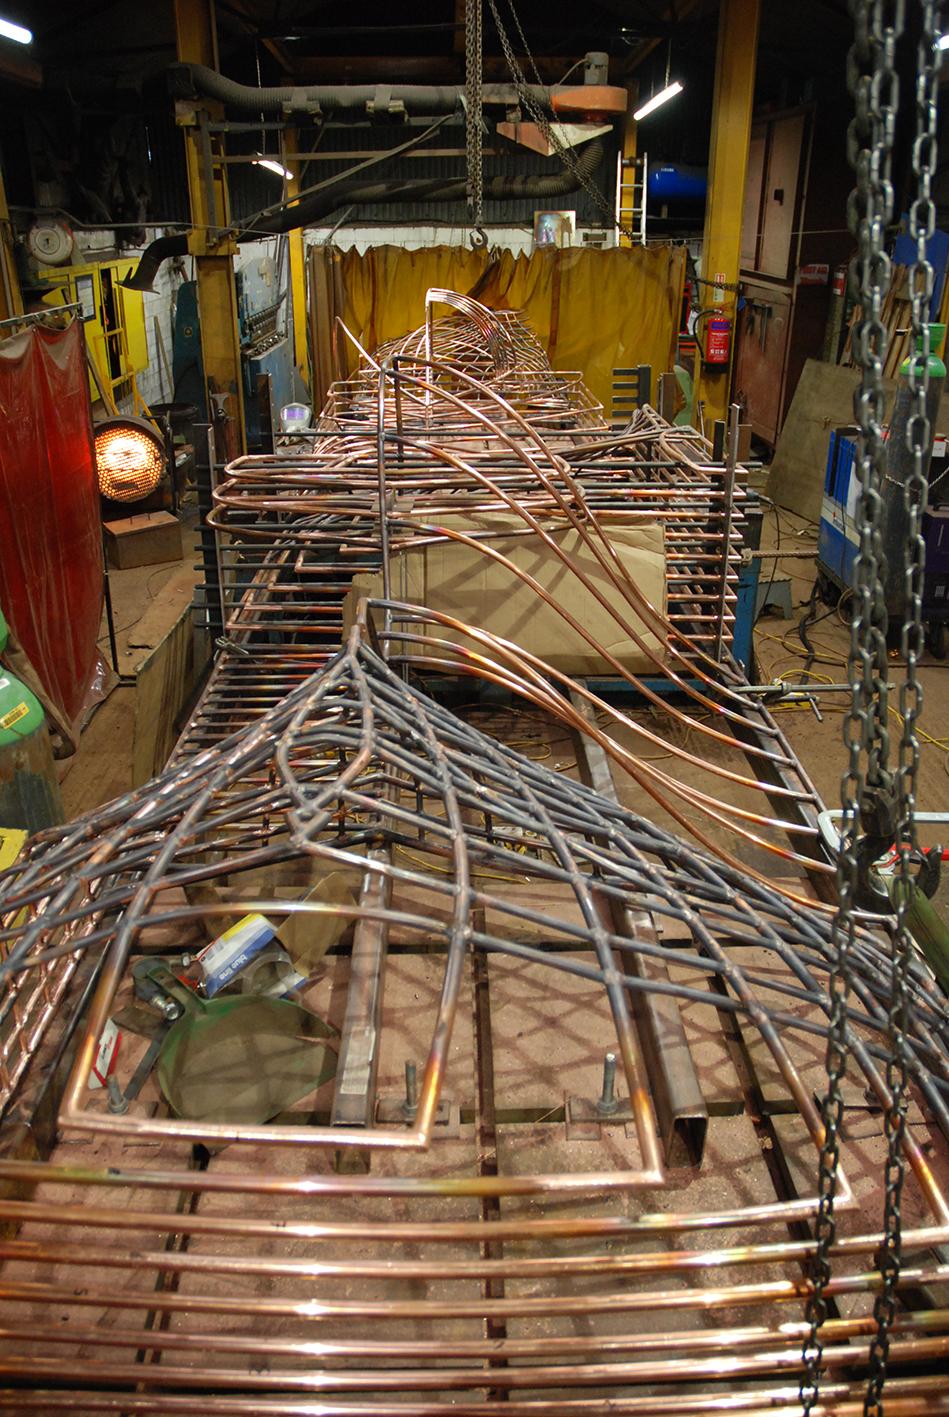 Copper Sculpture by Rebecca Gouldson under fabrication by Art Fabrications www.rebeccagouldson.co.uk